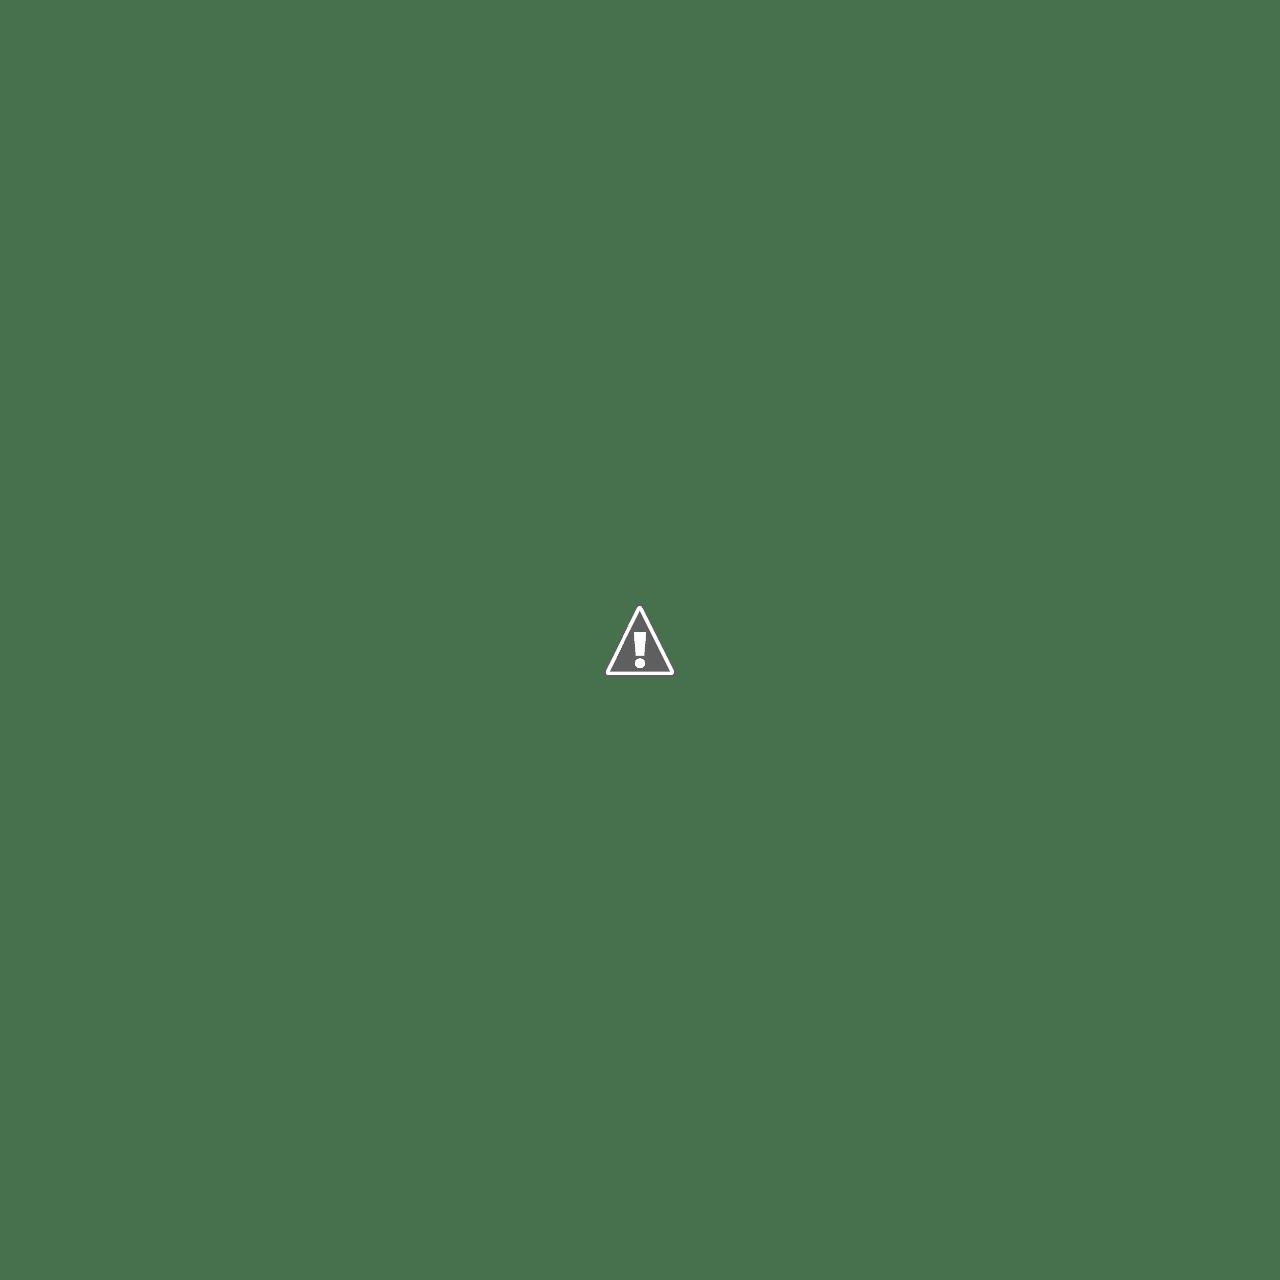 Al Marwan Heavy Equipment & Machinery Trading Est  - Your most